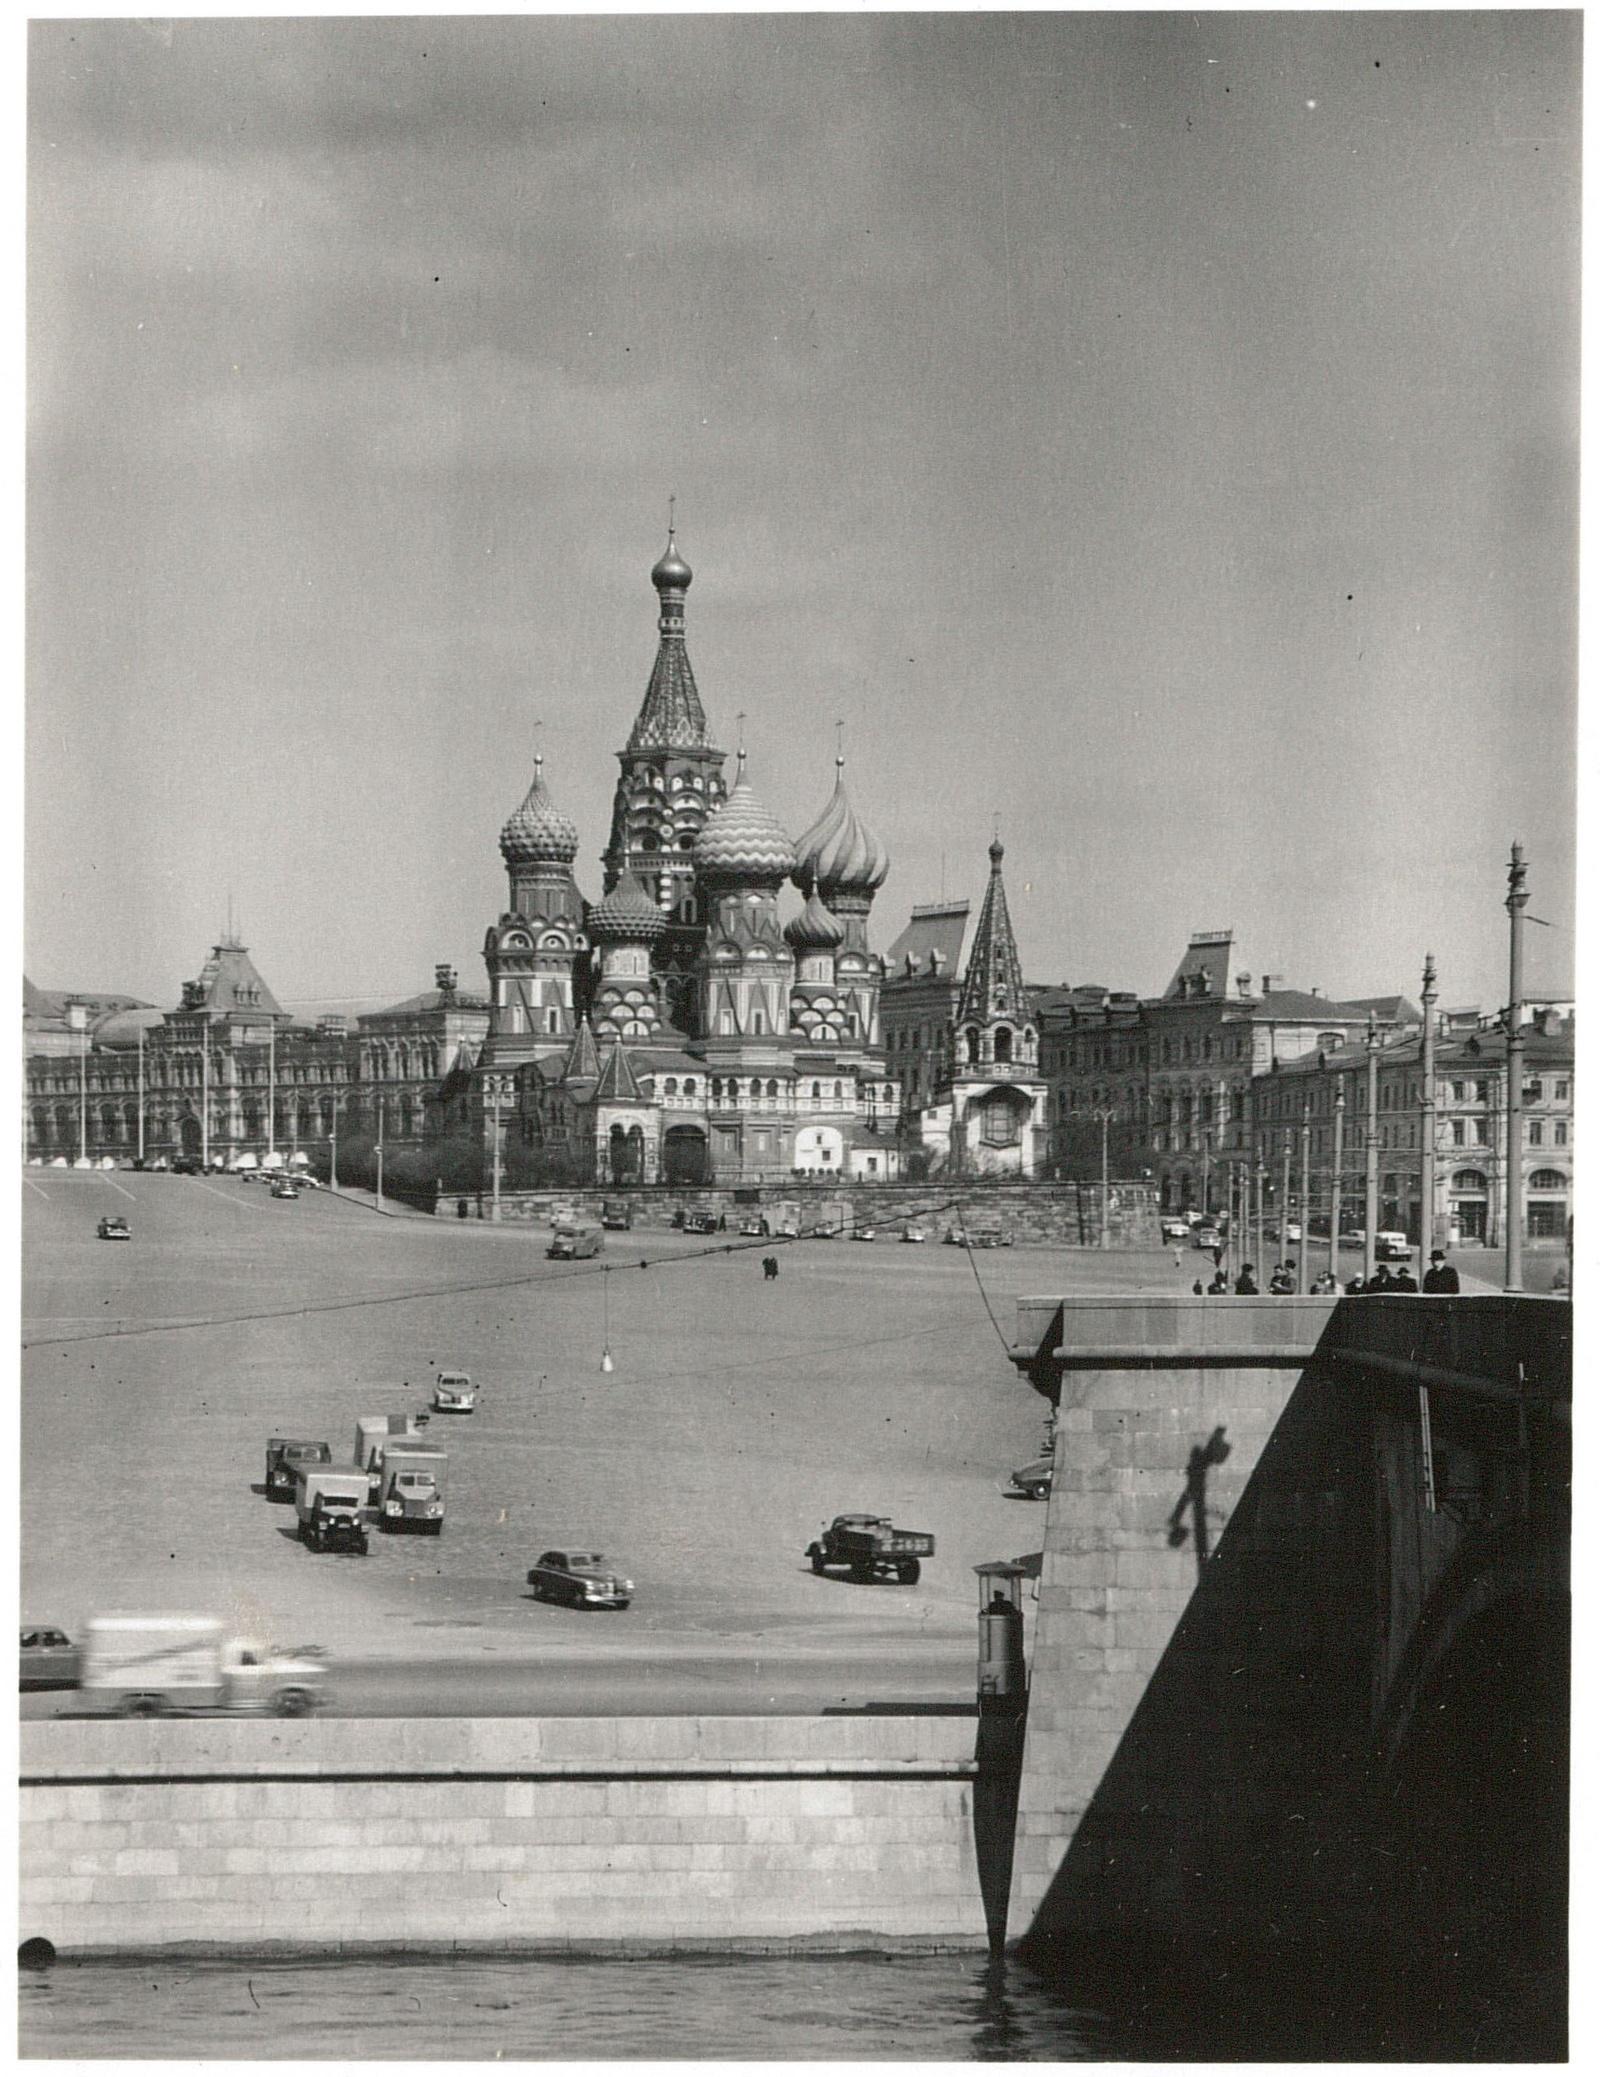 Собор Василия Блаженного. Вид с юга через Москву-реку